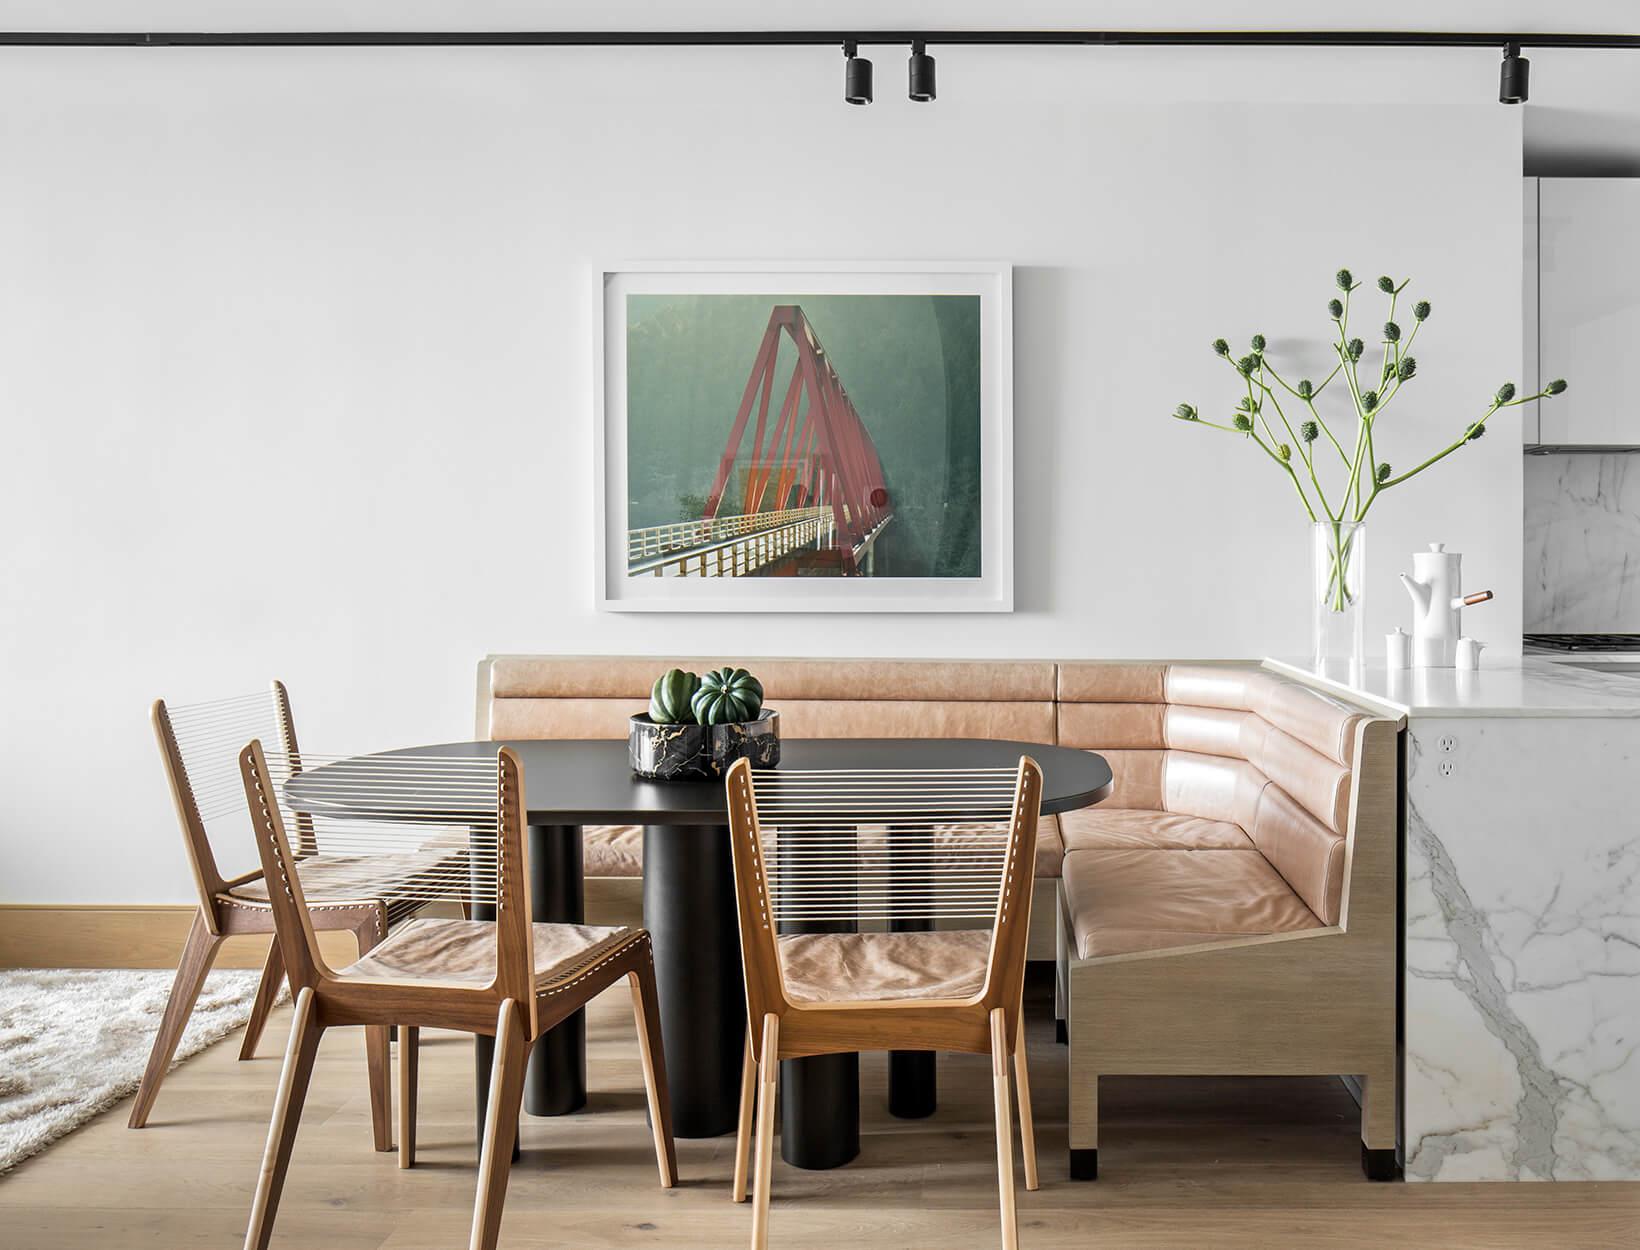 Lighting Designer's Advice on How to Light a Room